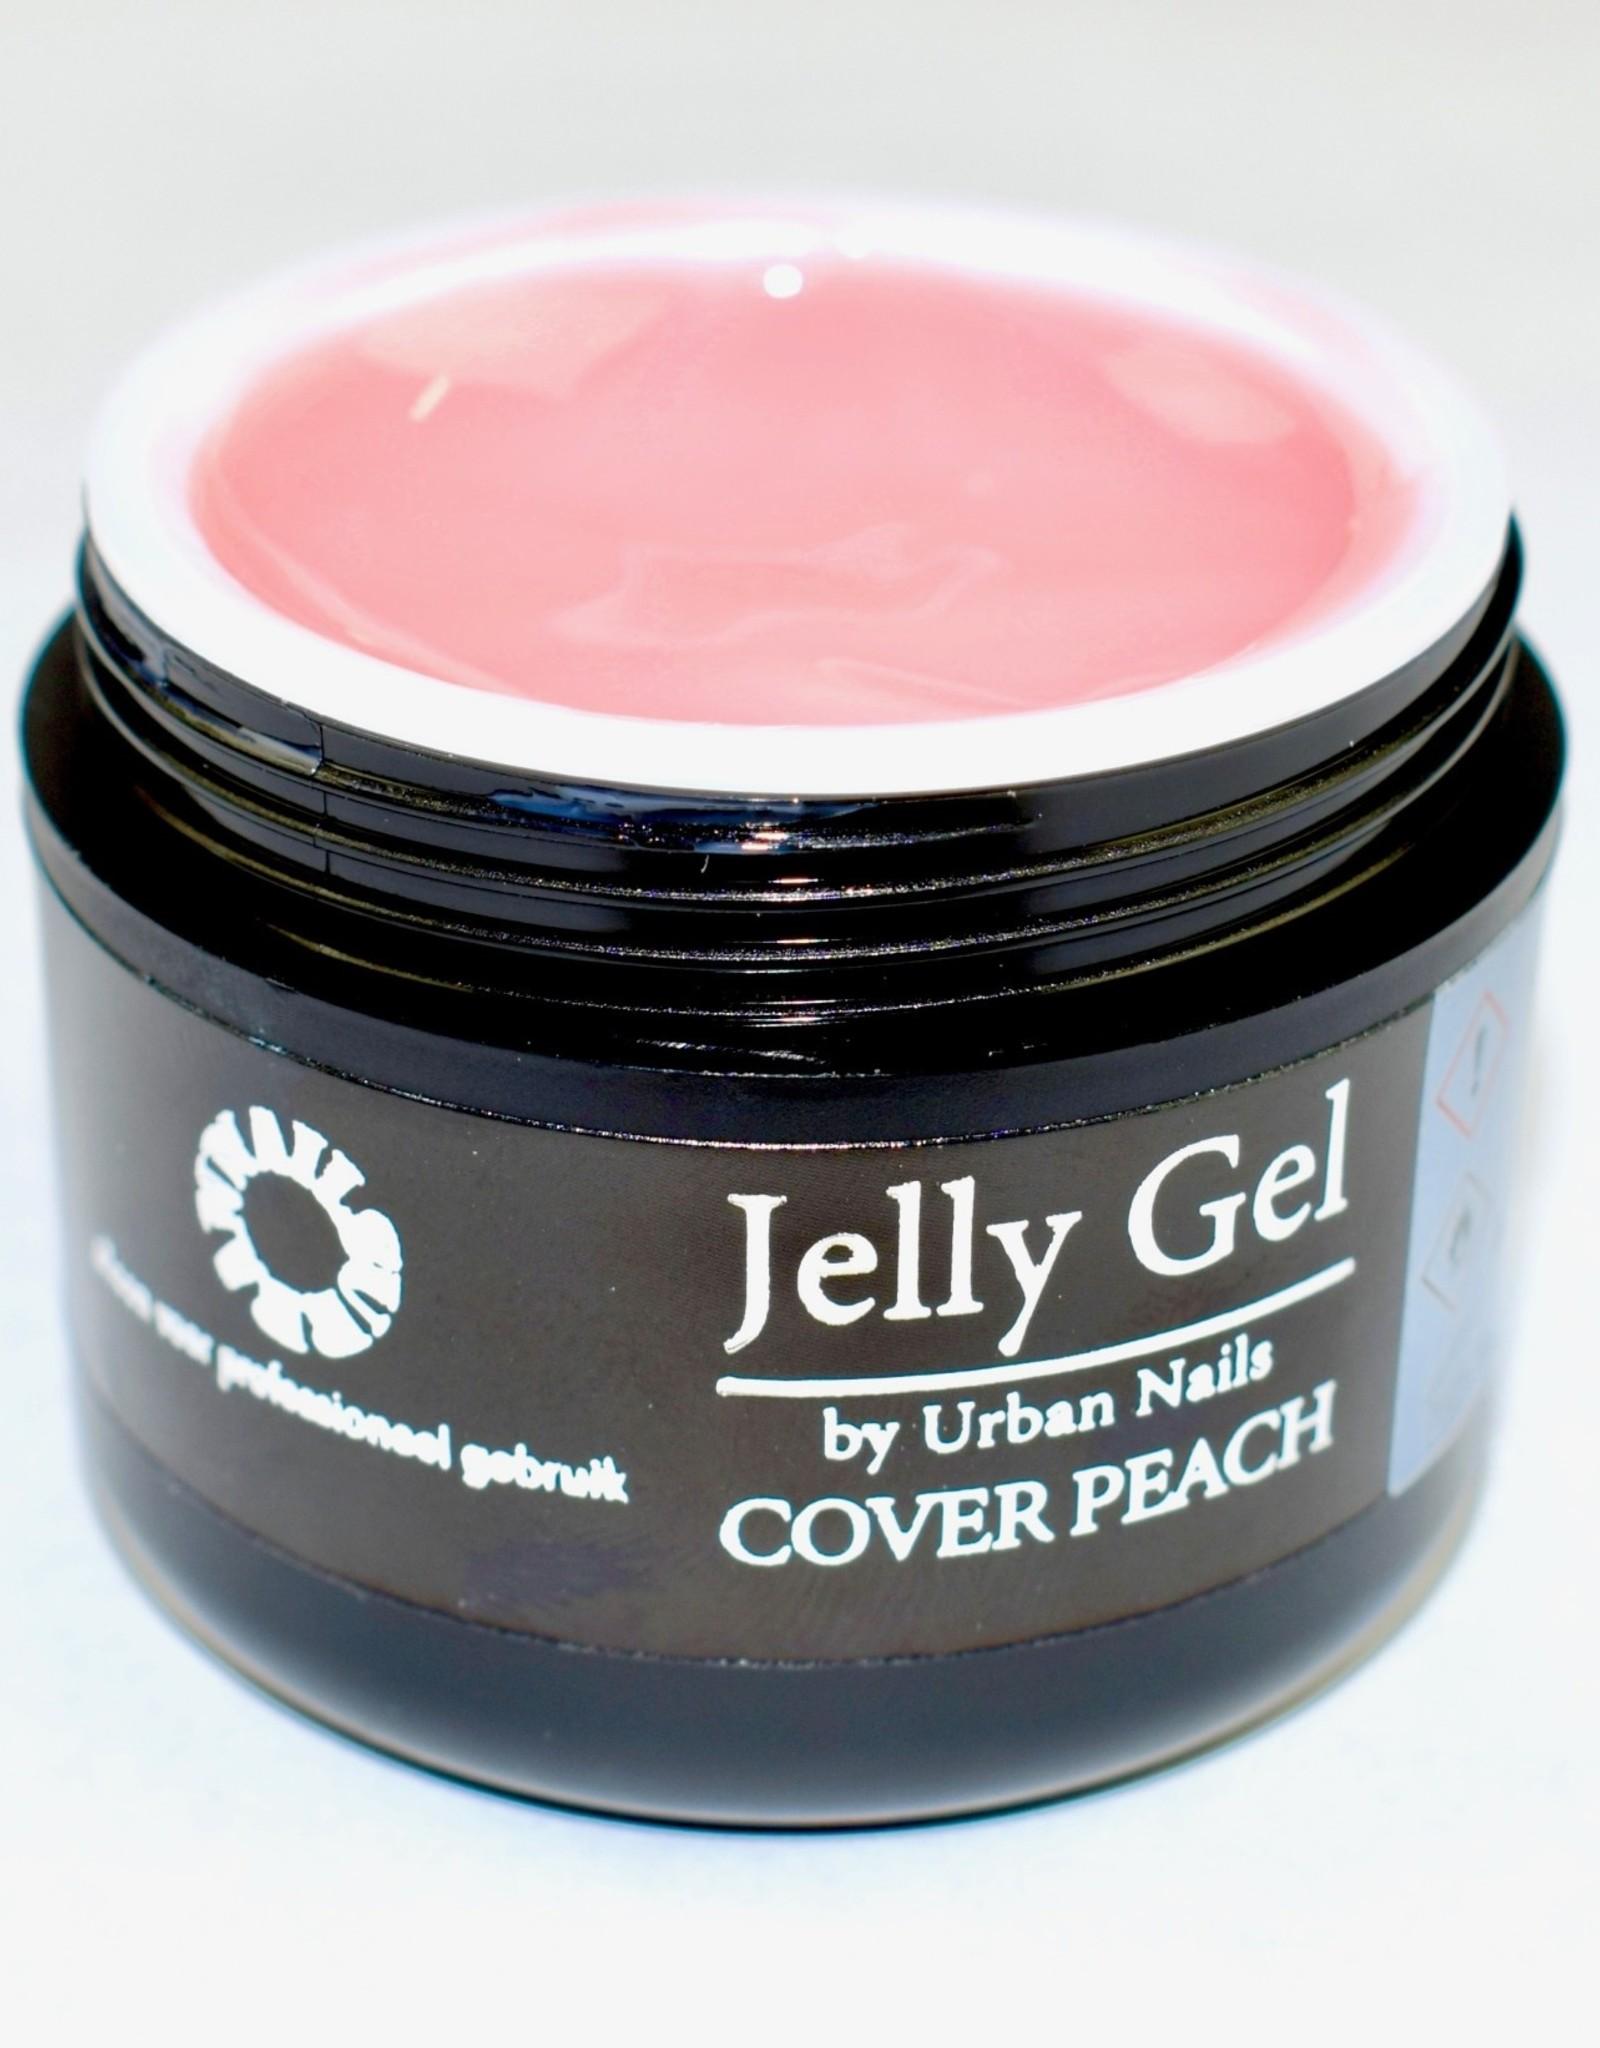 Urban Nails Jelly Gel Cover Peach